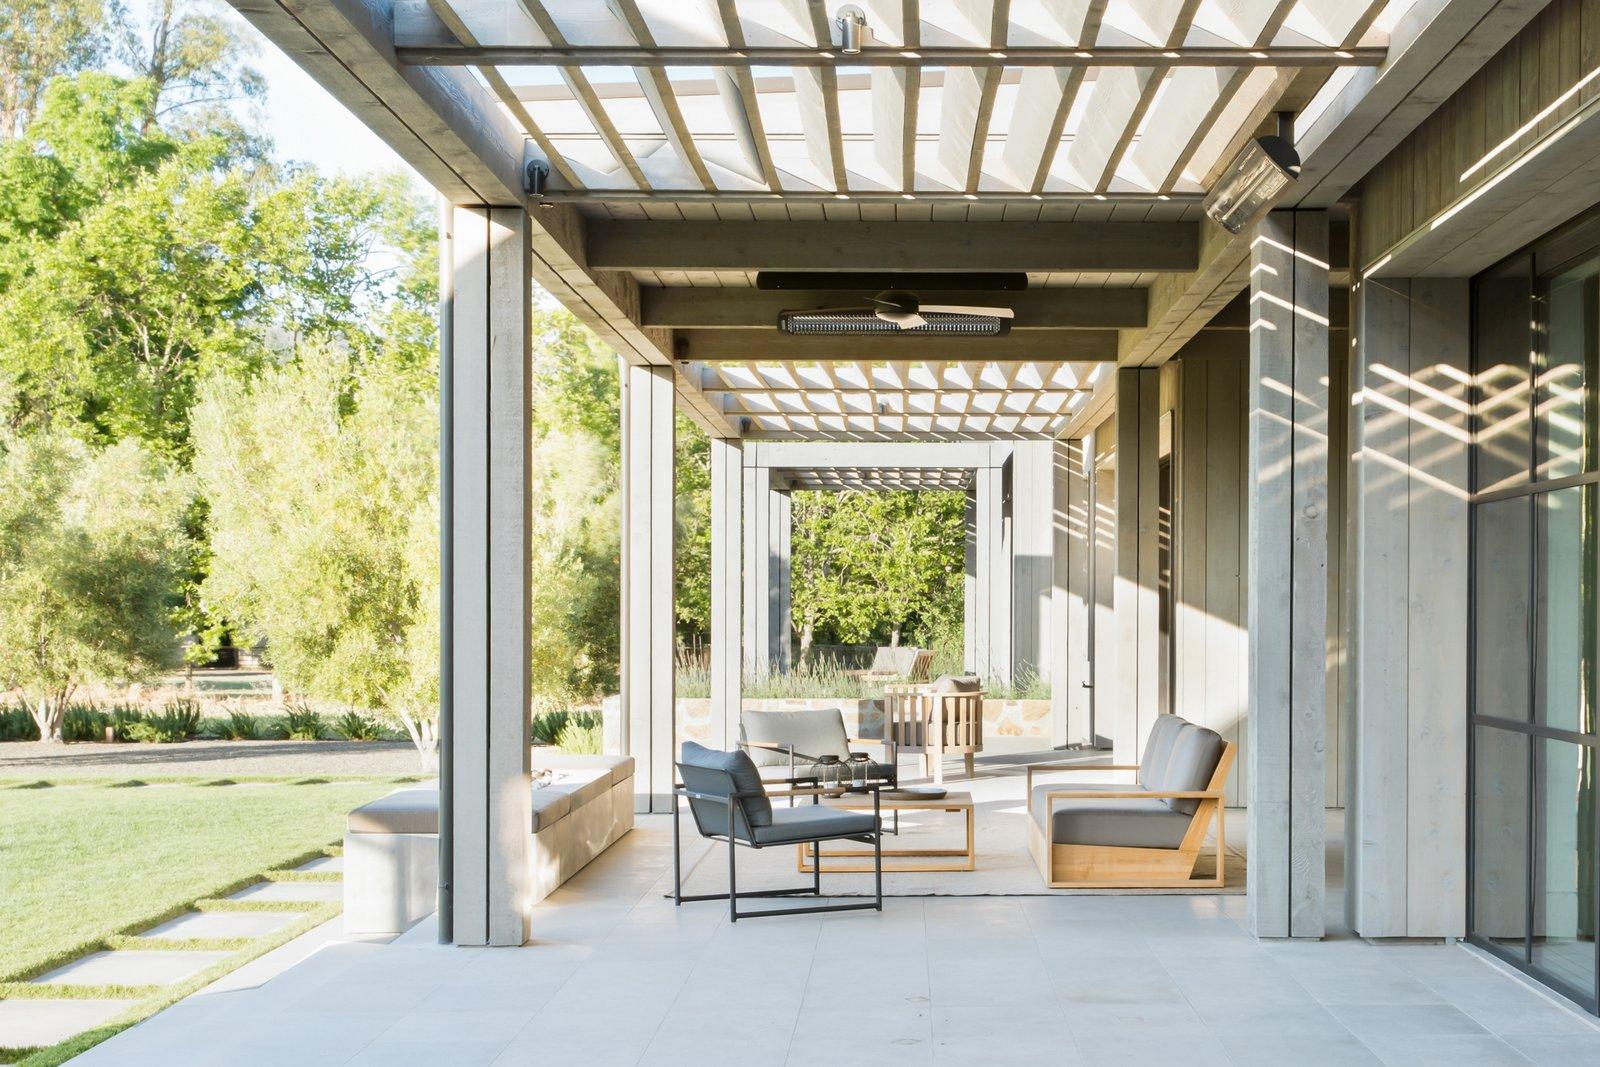 Calistoga Residence patio